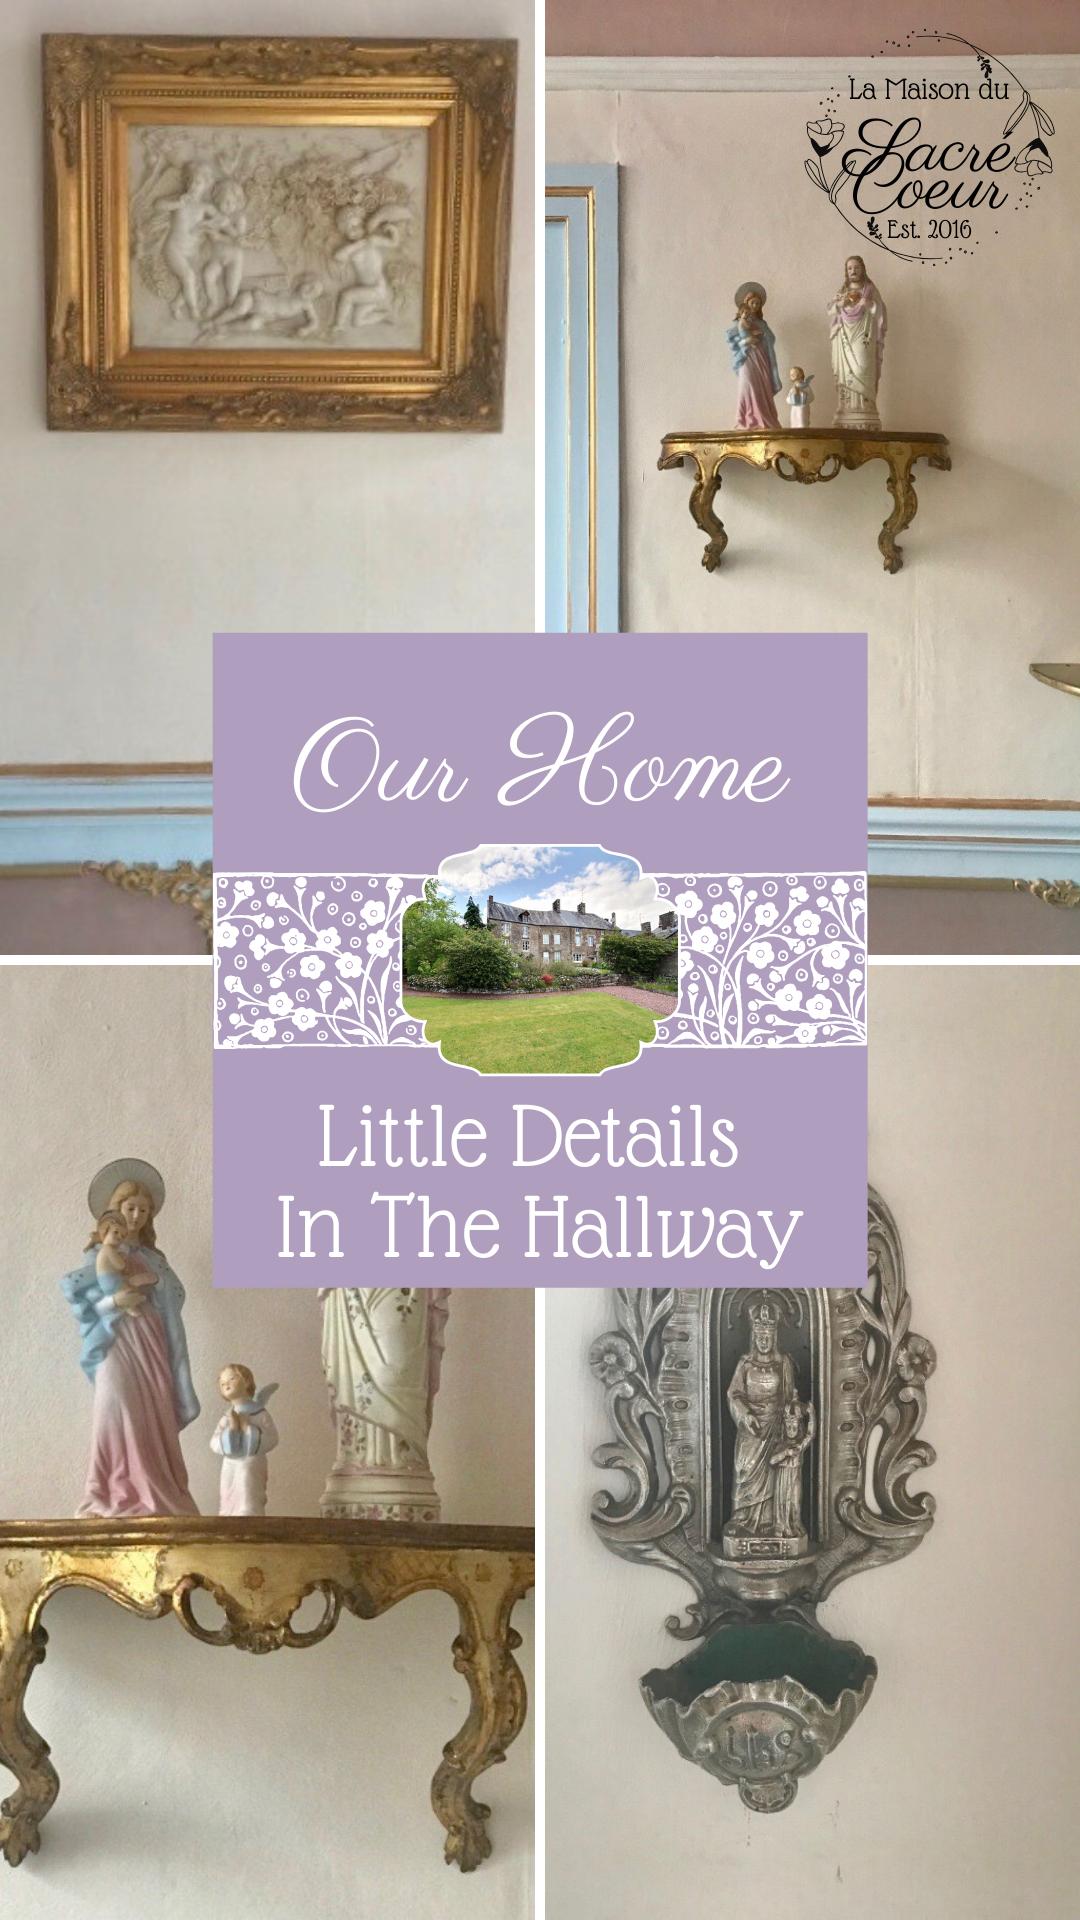 Little Details in the Hallway